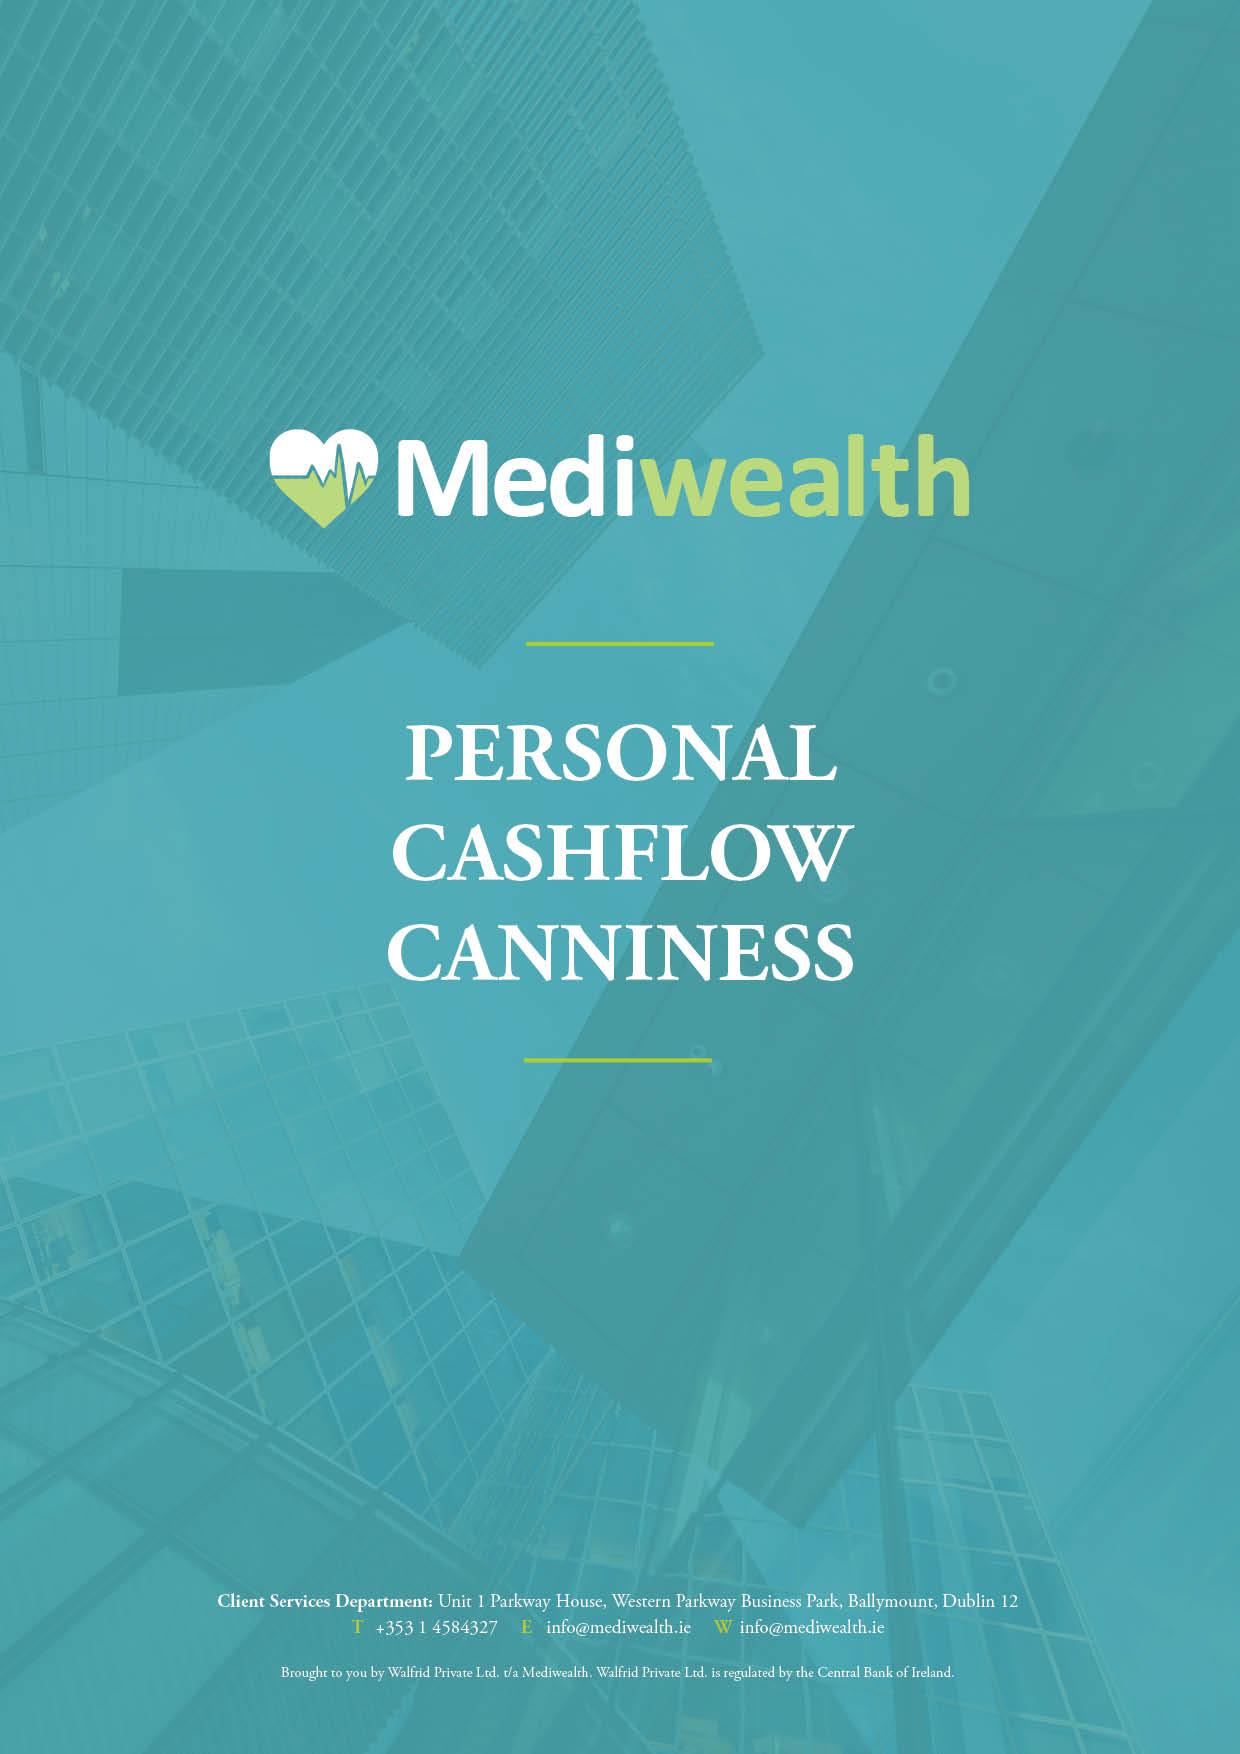 personal cashflow canniness mediwealth